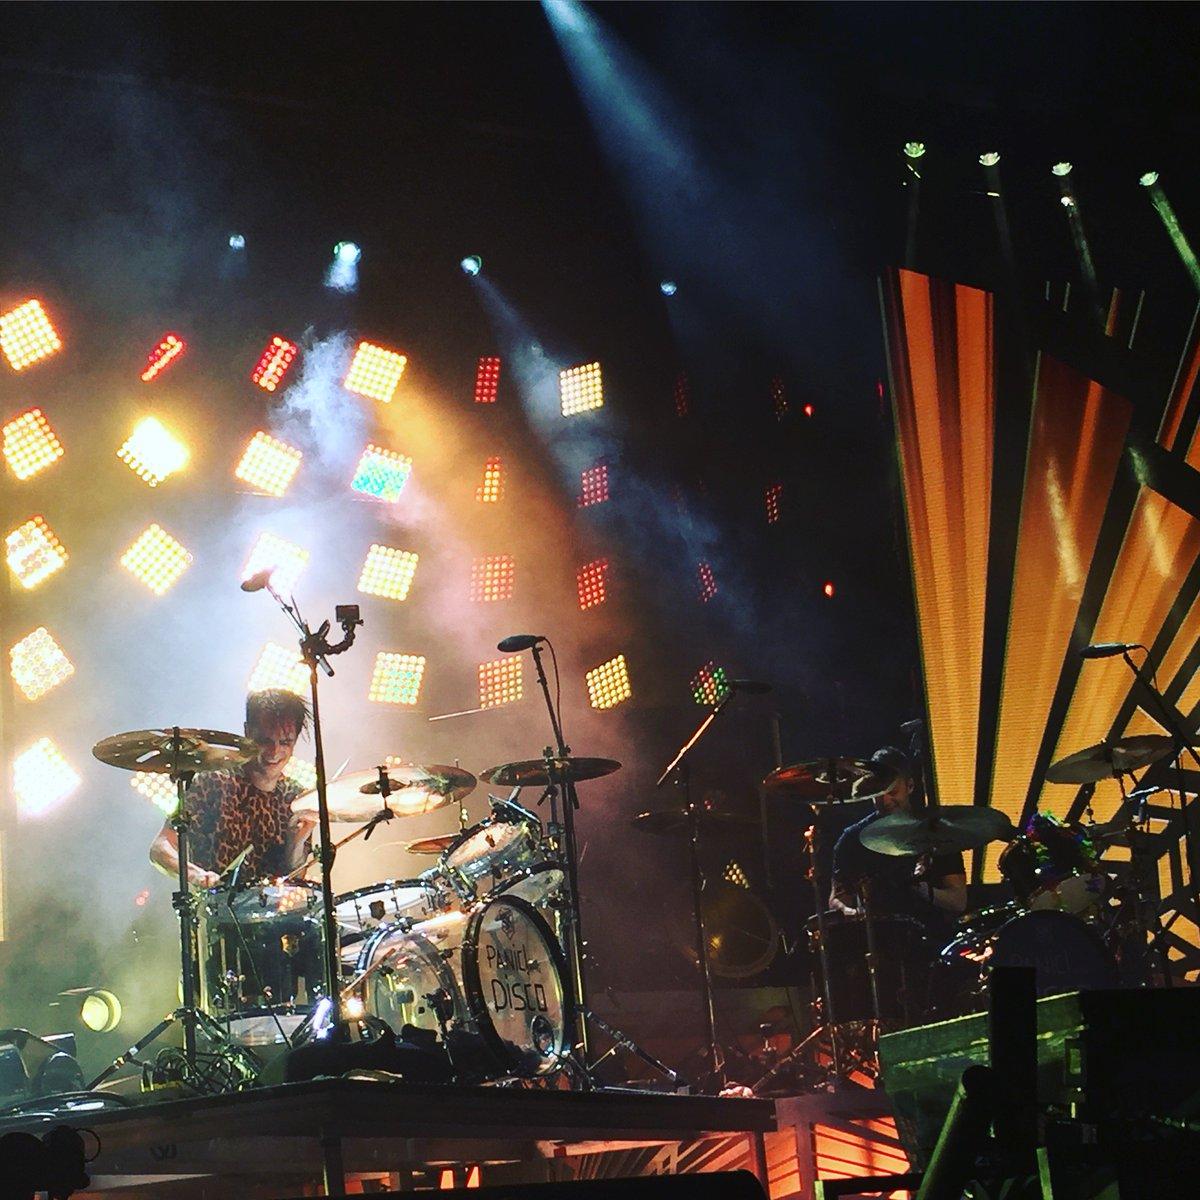 weezer and panic at the disco summer tour 2016 lakewood amphitheatre atlanta ga on 6 16. Black Bedroom Furniture Sets. Home Design Ideas